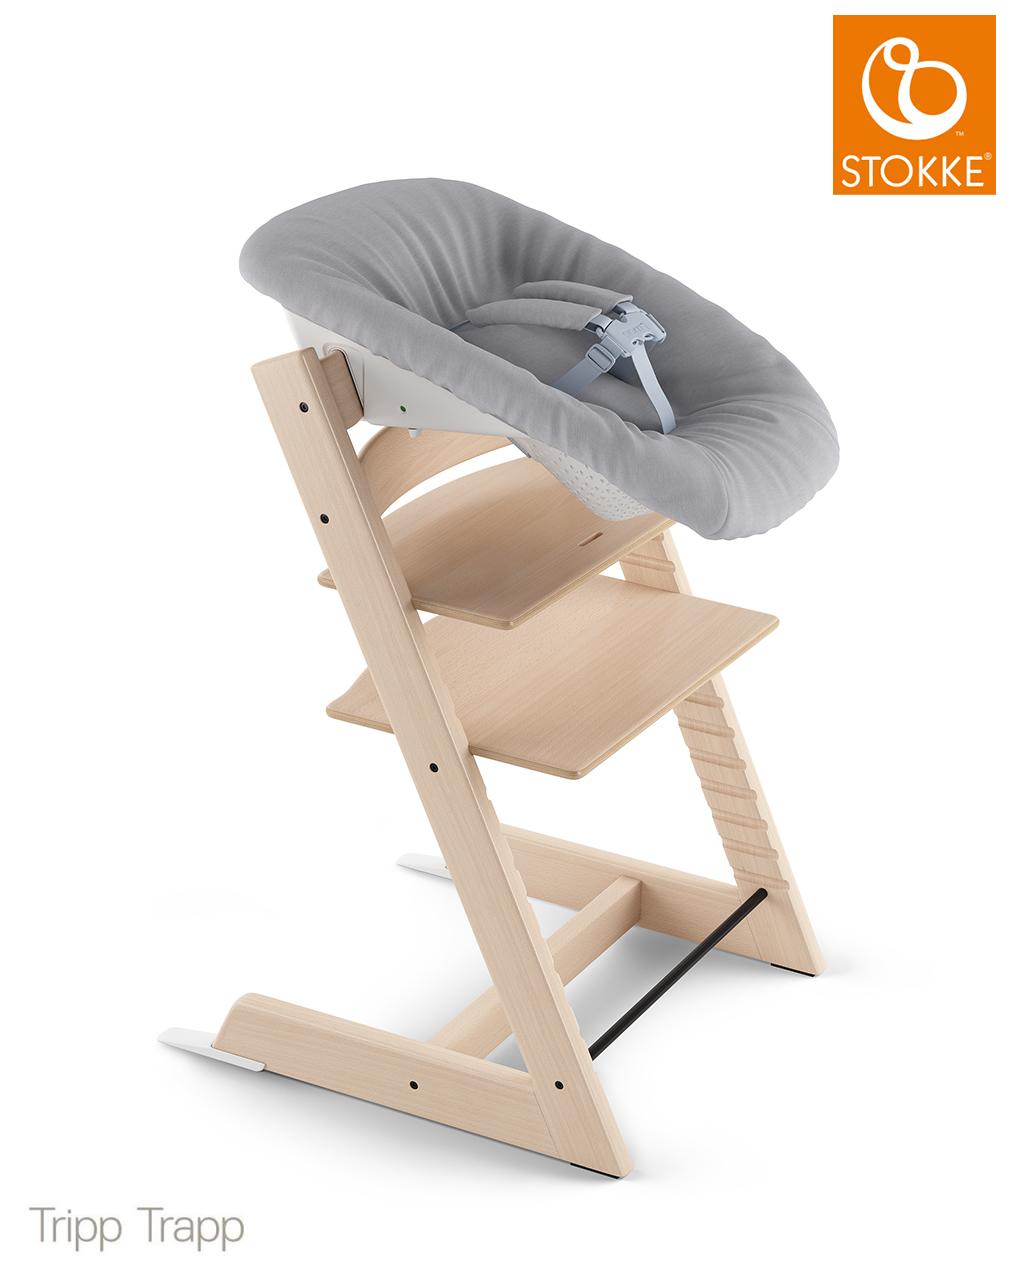 Tripp trapp® newborn set con gancio appendigiochi  - grey - Stokke